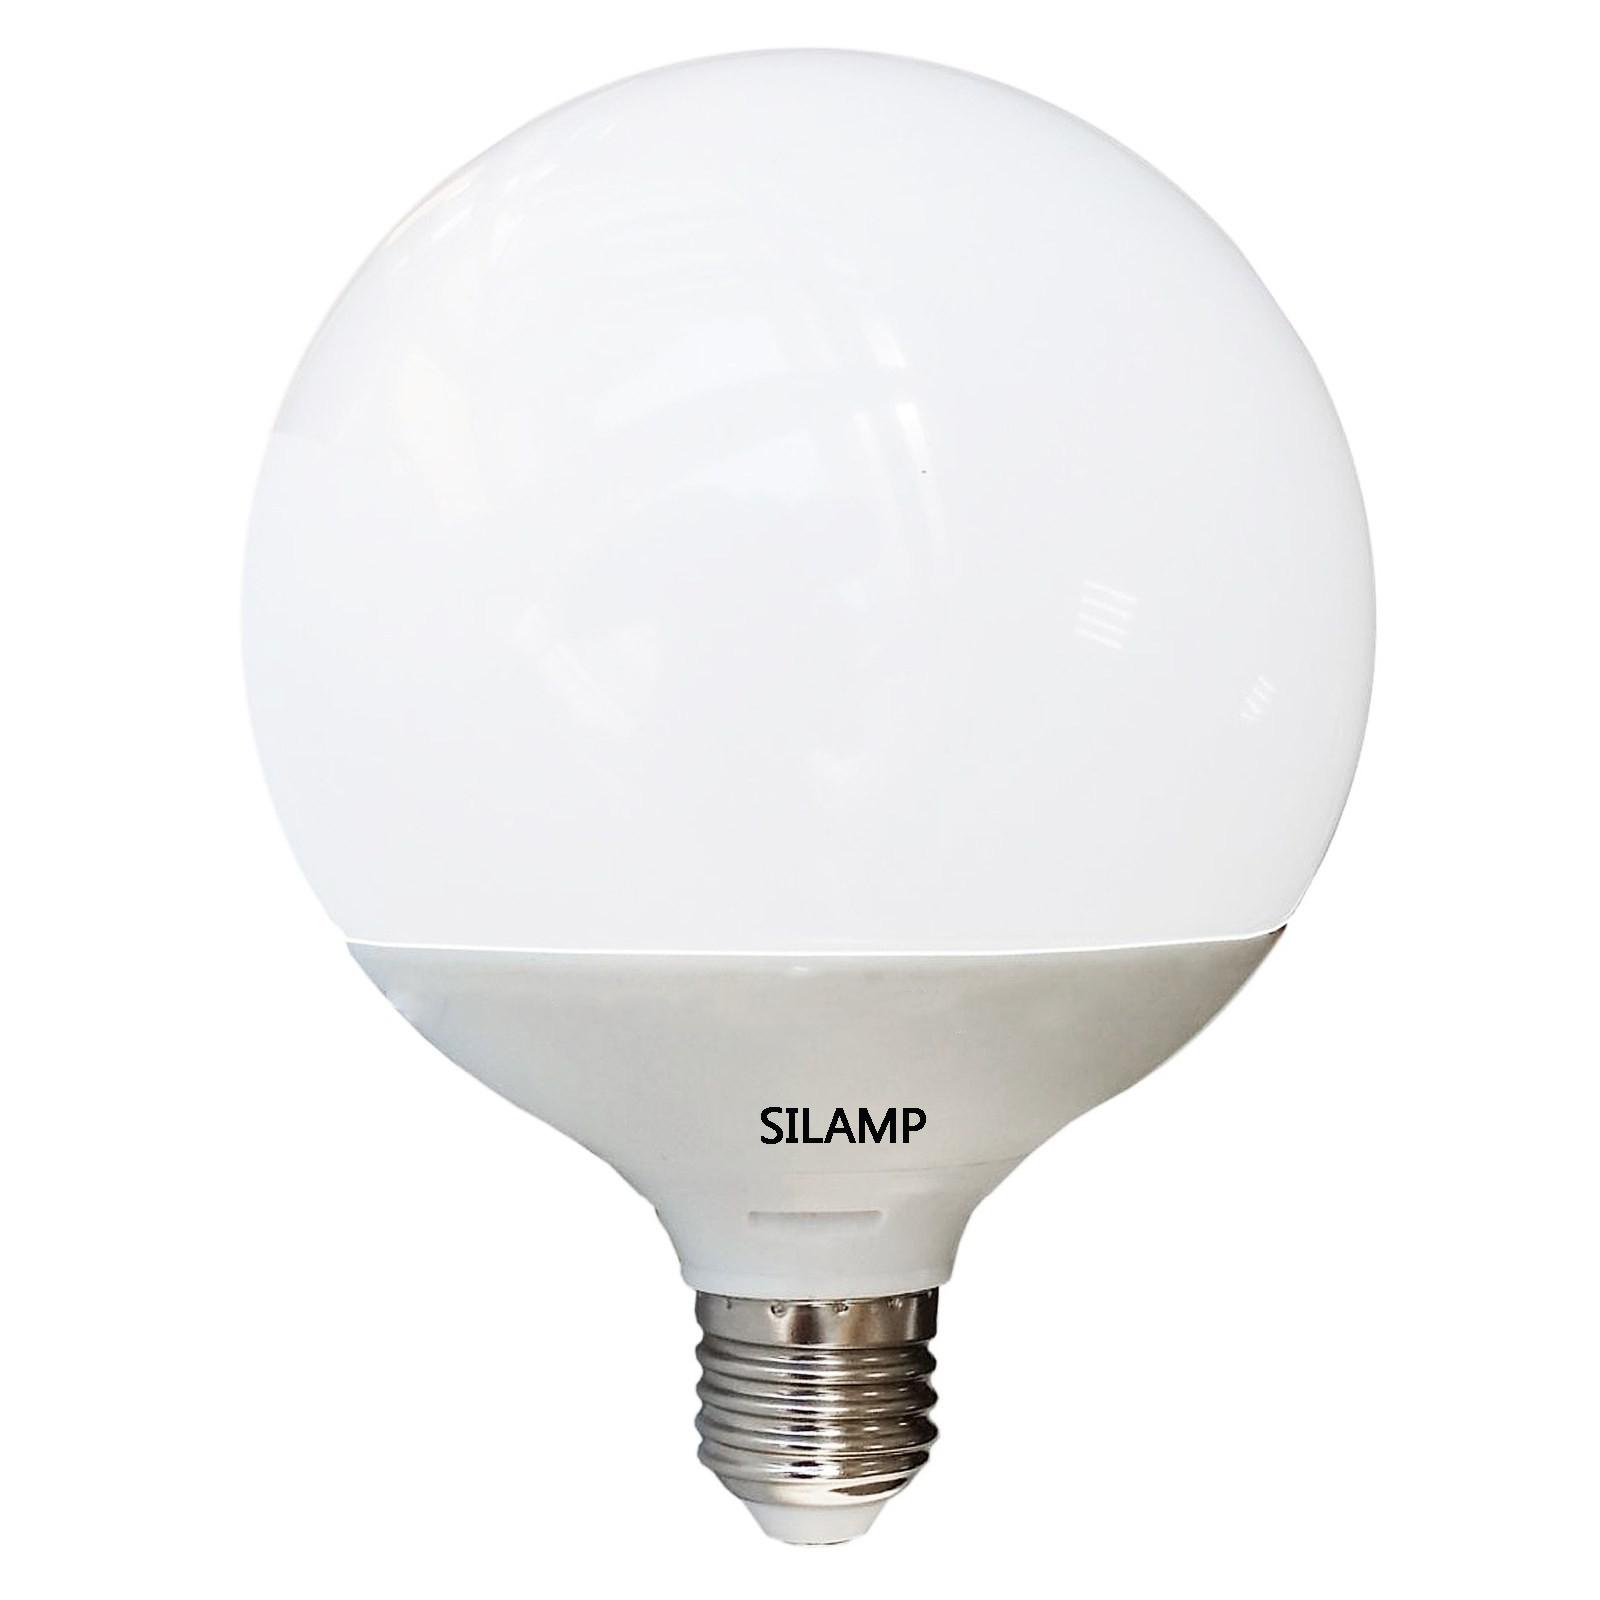 G120 18w offerte lampadine led silamp lampadina a for Costo lampadine led